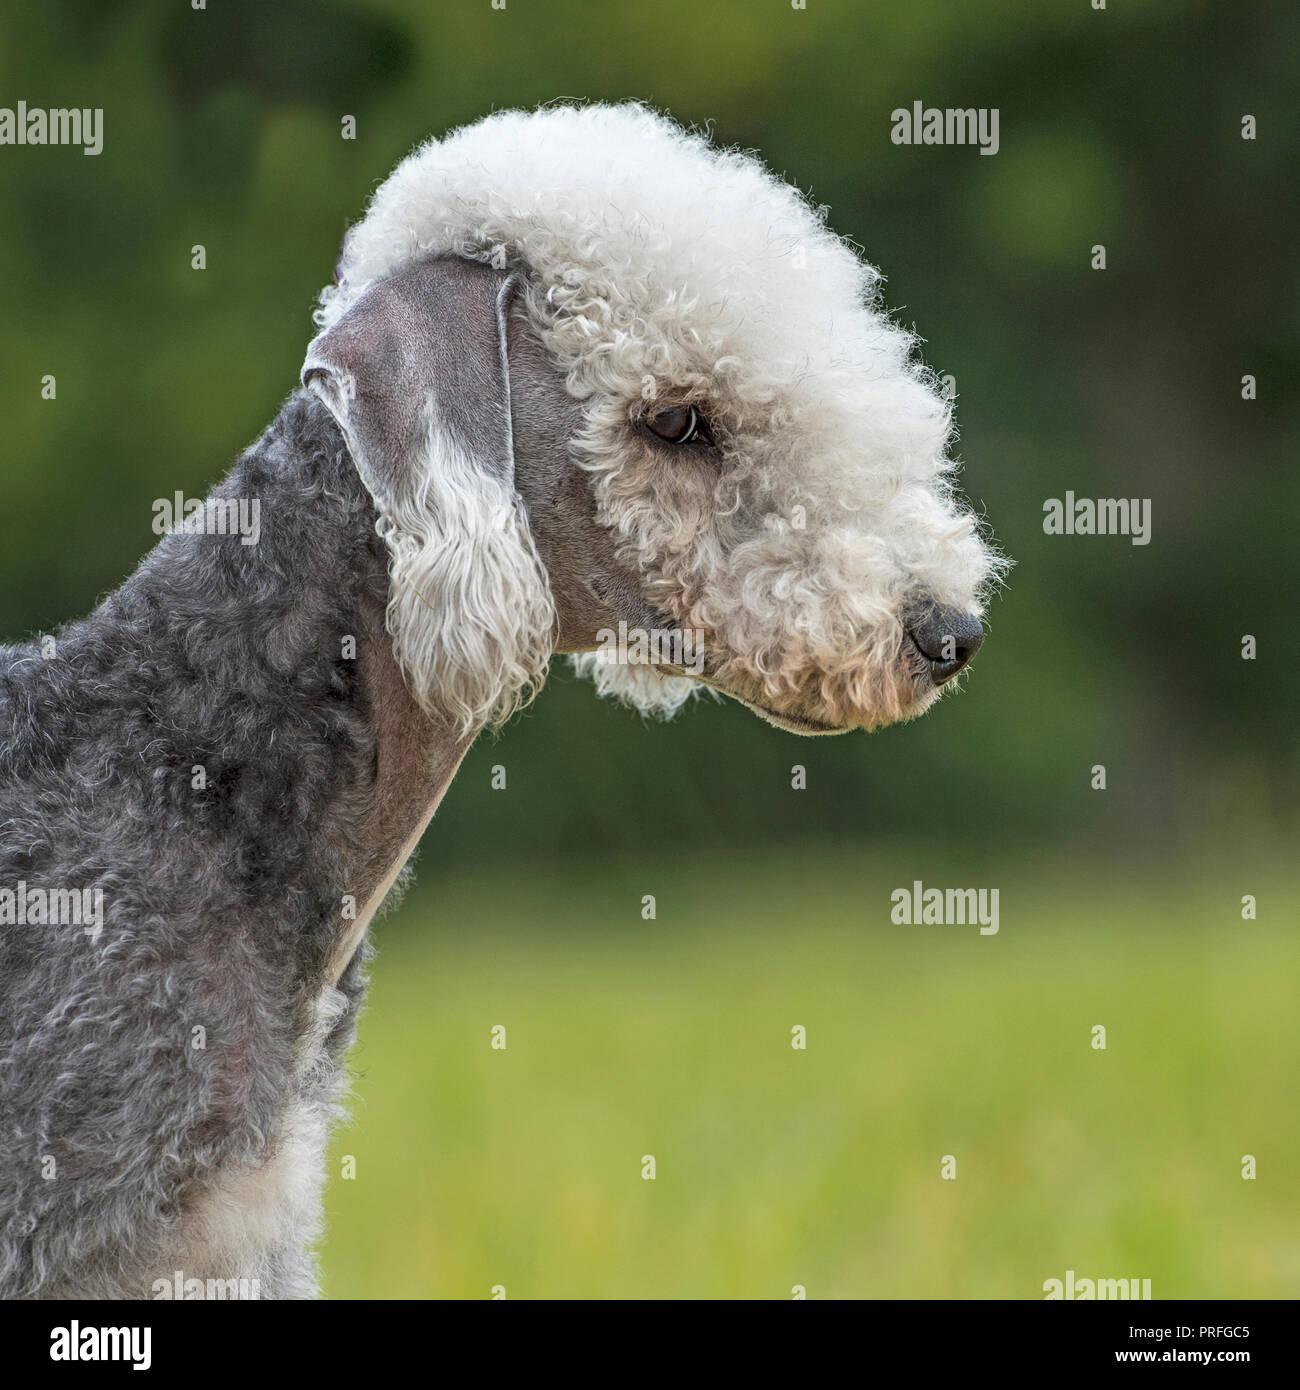 Bedlington Terrier Stock Photo 221003669 Alamy